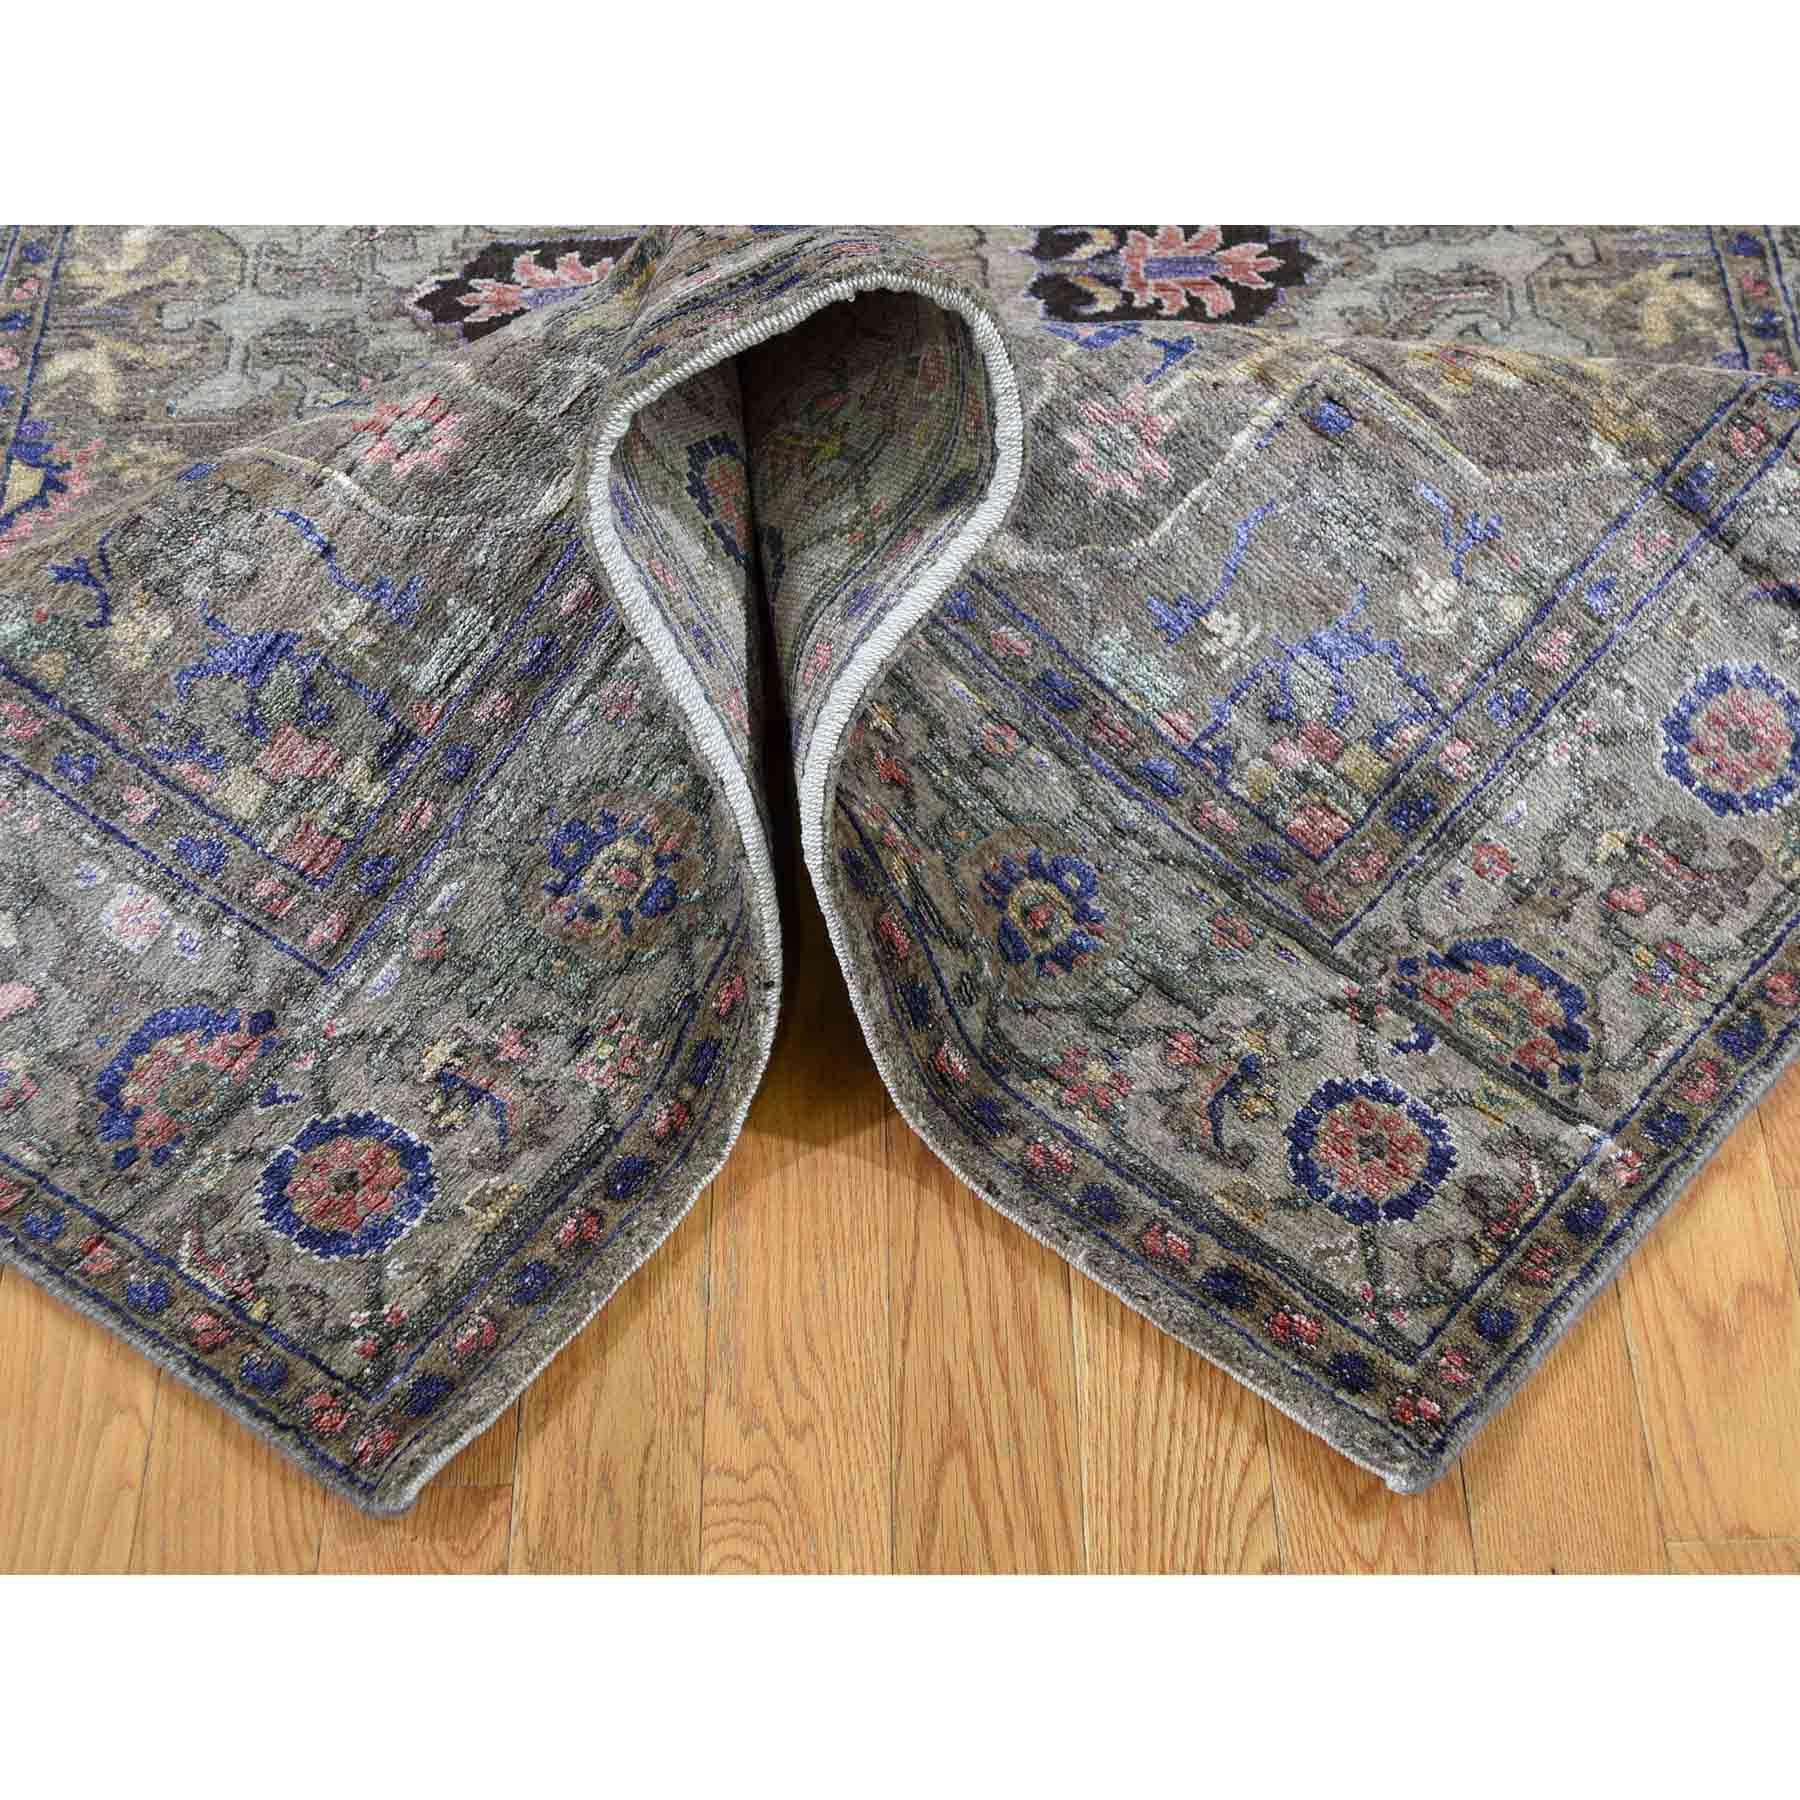 5-x7- Hand-Knotted Heriz Design Wool and Silk Plush Oriental Rug